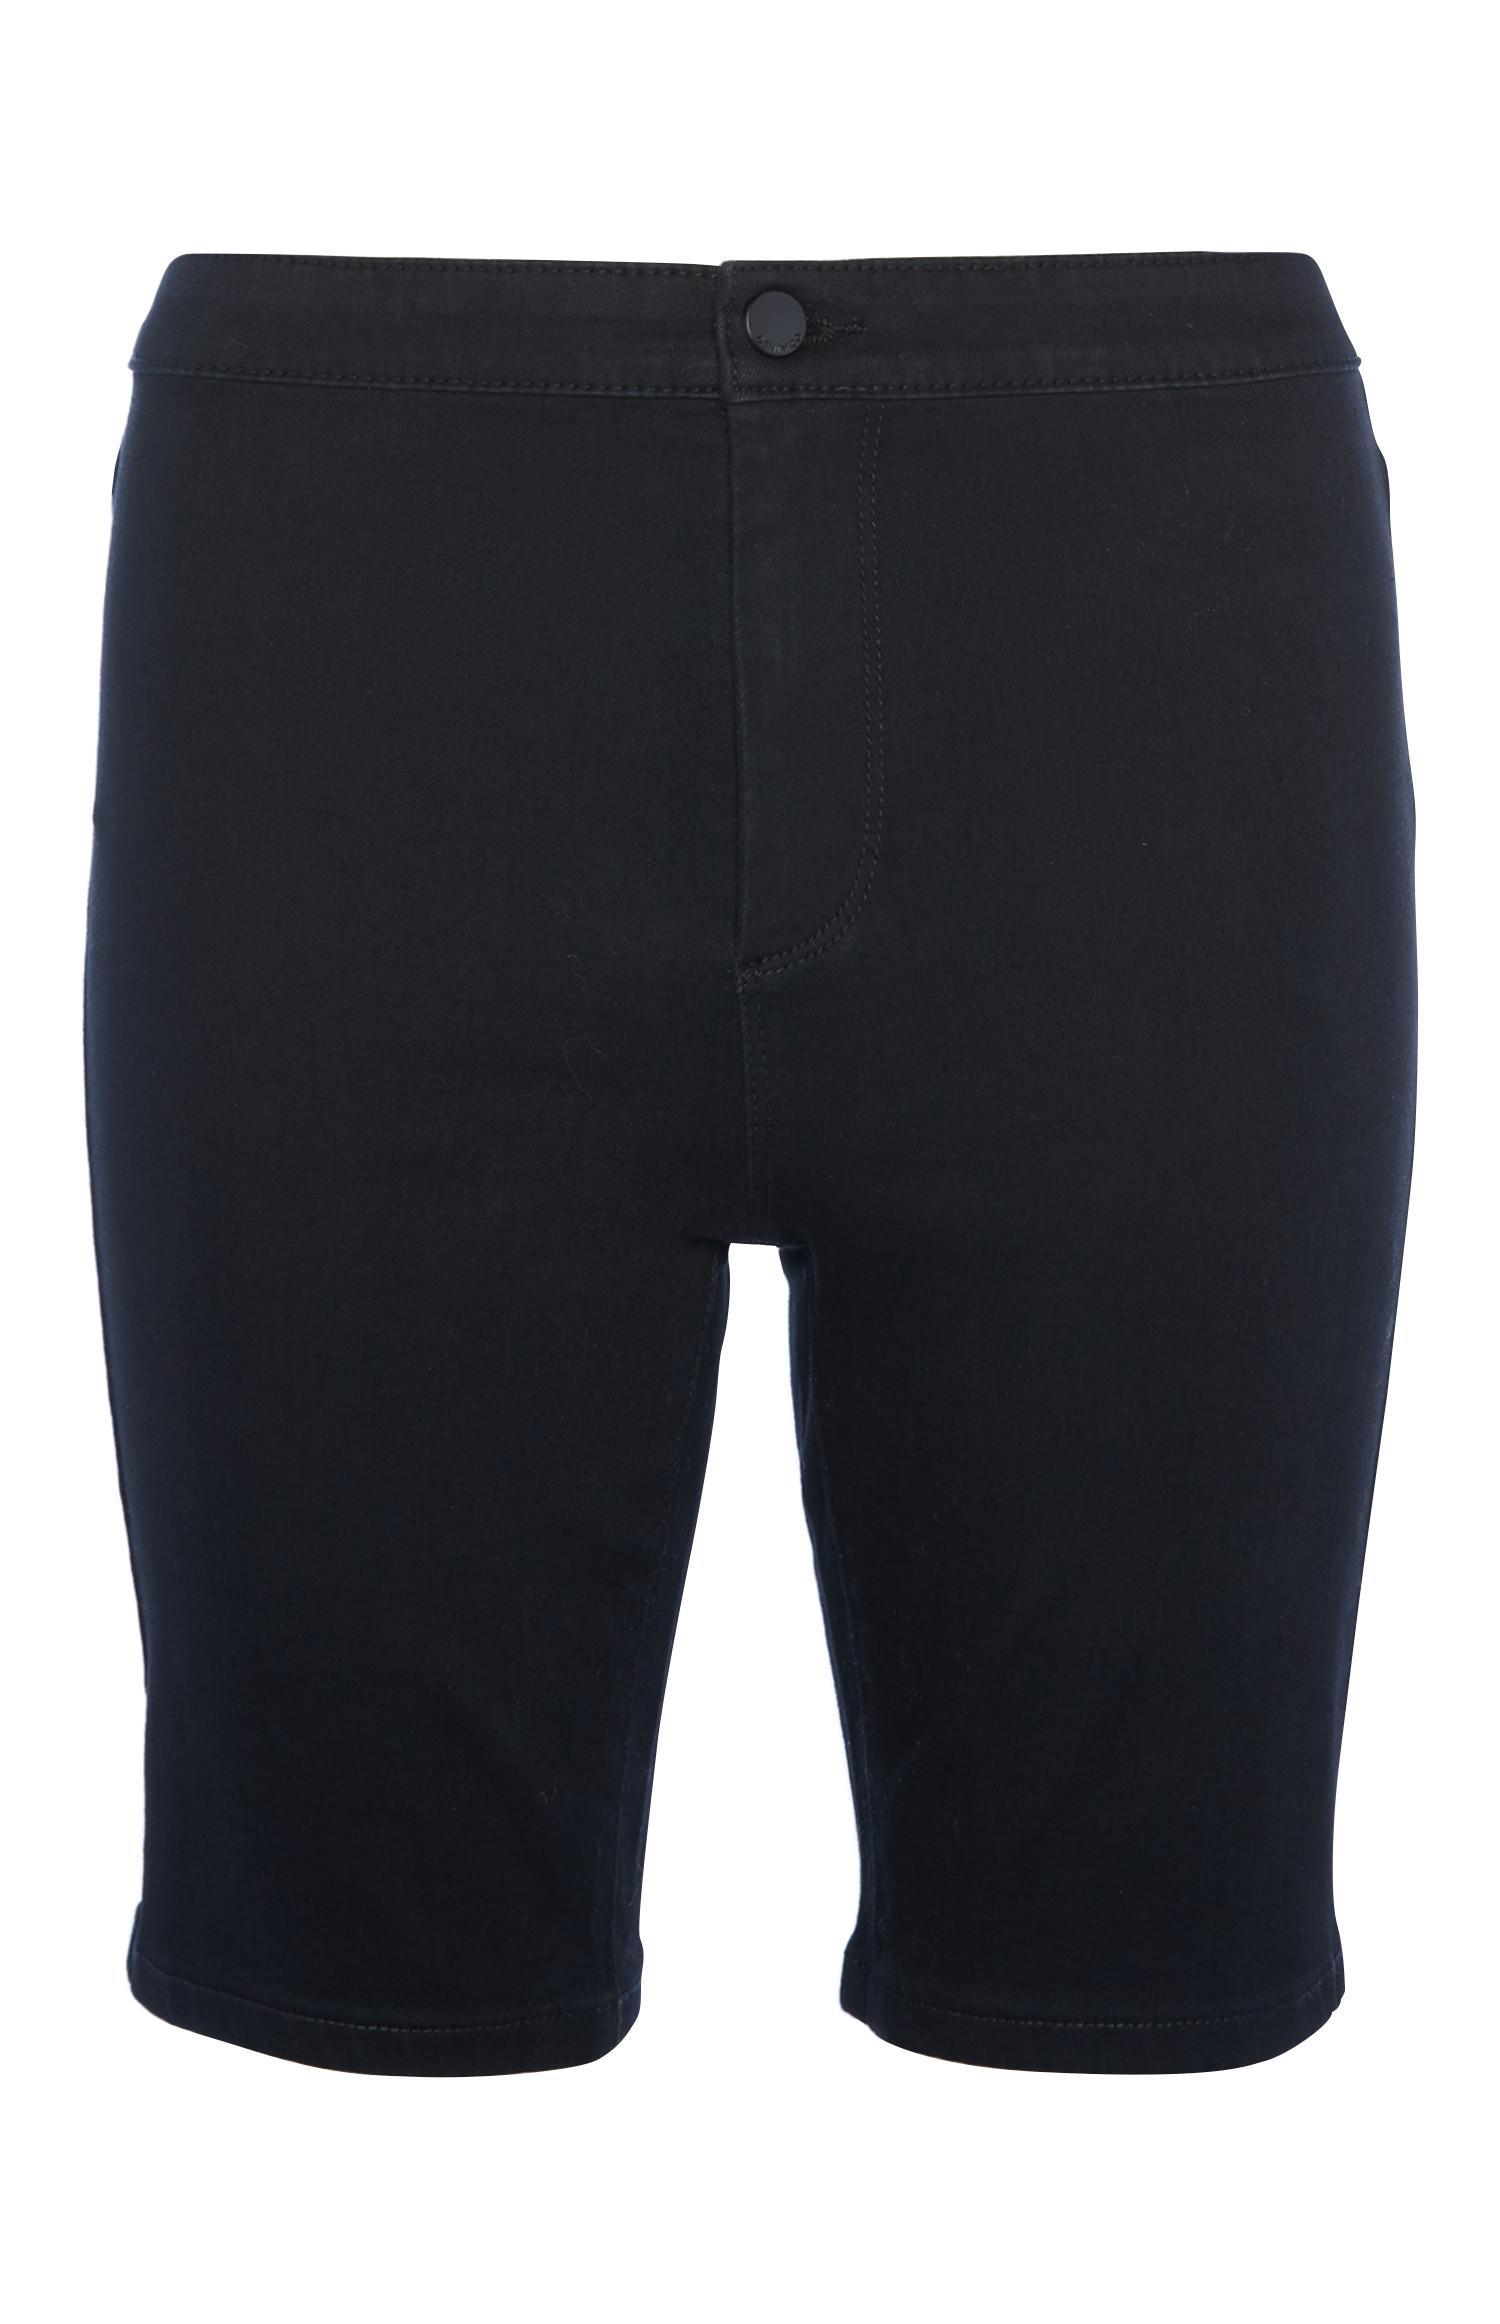 Black Denim Cycle Short